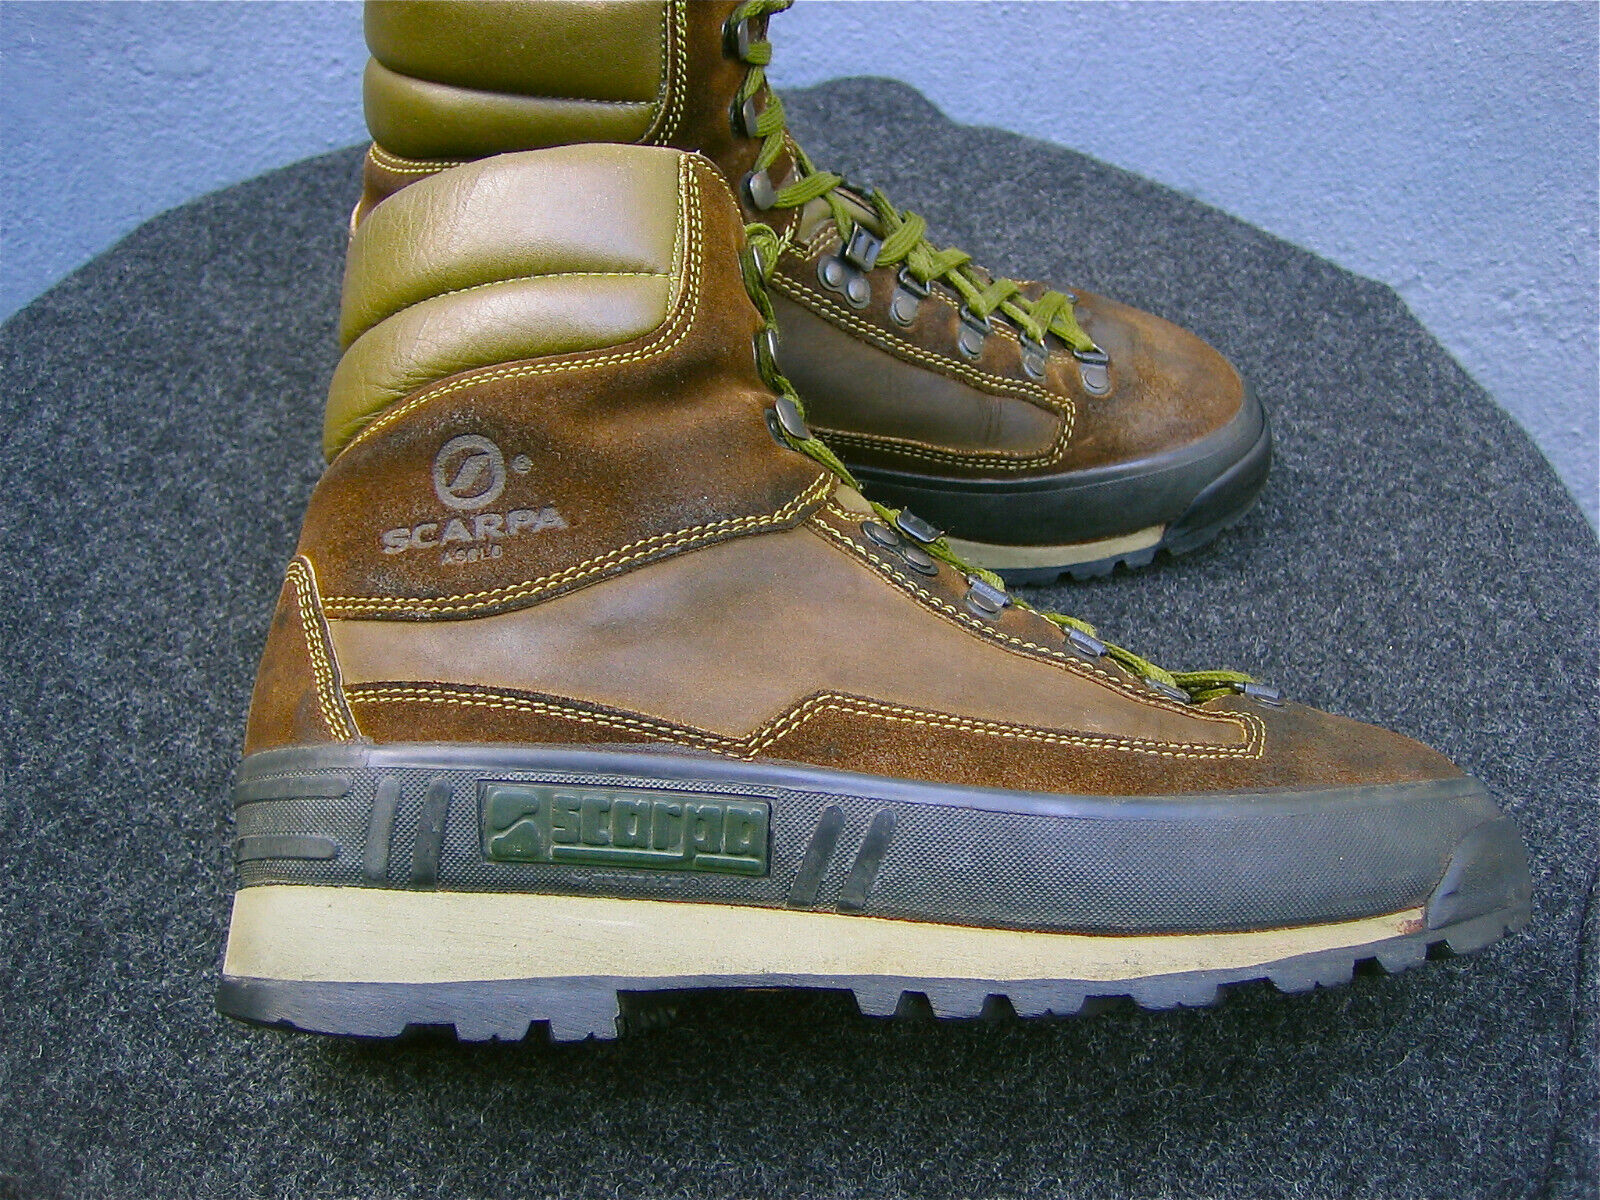 SCARPA (ASOLO) Wanderschuhe Stiefel Trekking ***UK 8 / EUR 42*** VIBRAM Leder